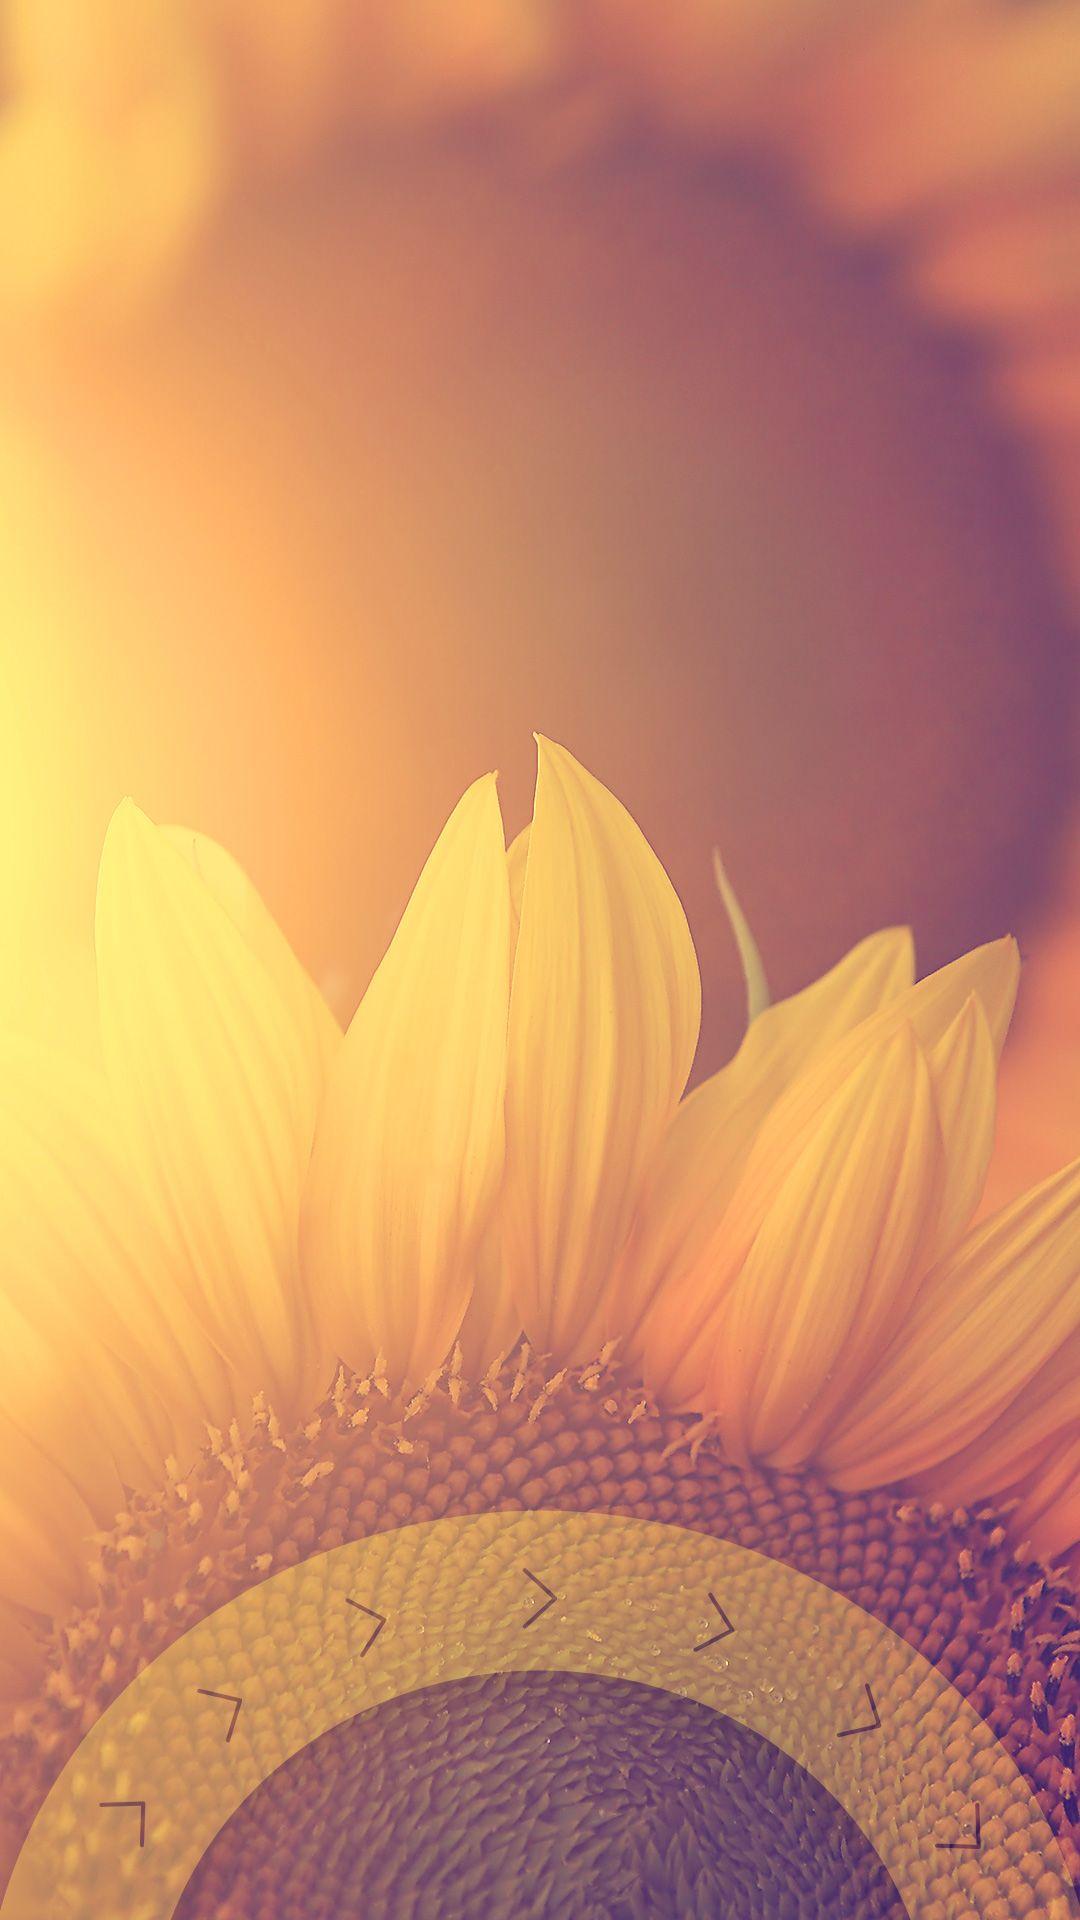 ↑↑TAP AND GET THE FREE APP! Lockscreens Art Creative Sun Flower Summer HD iPhone 6 Plus Lock Screen